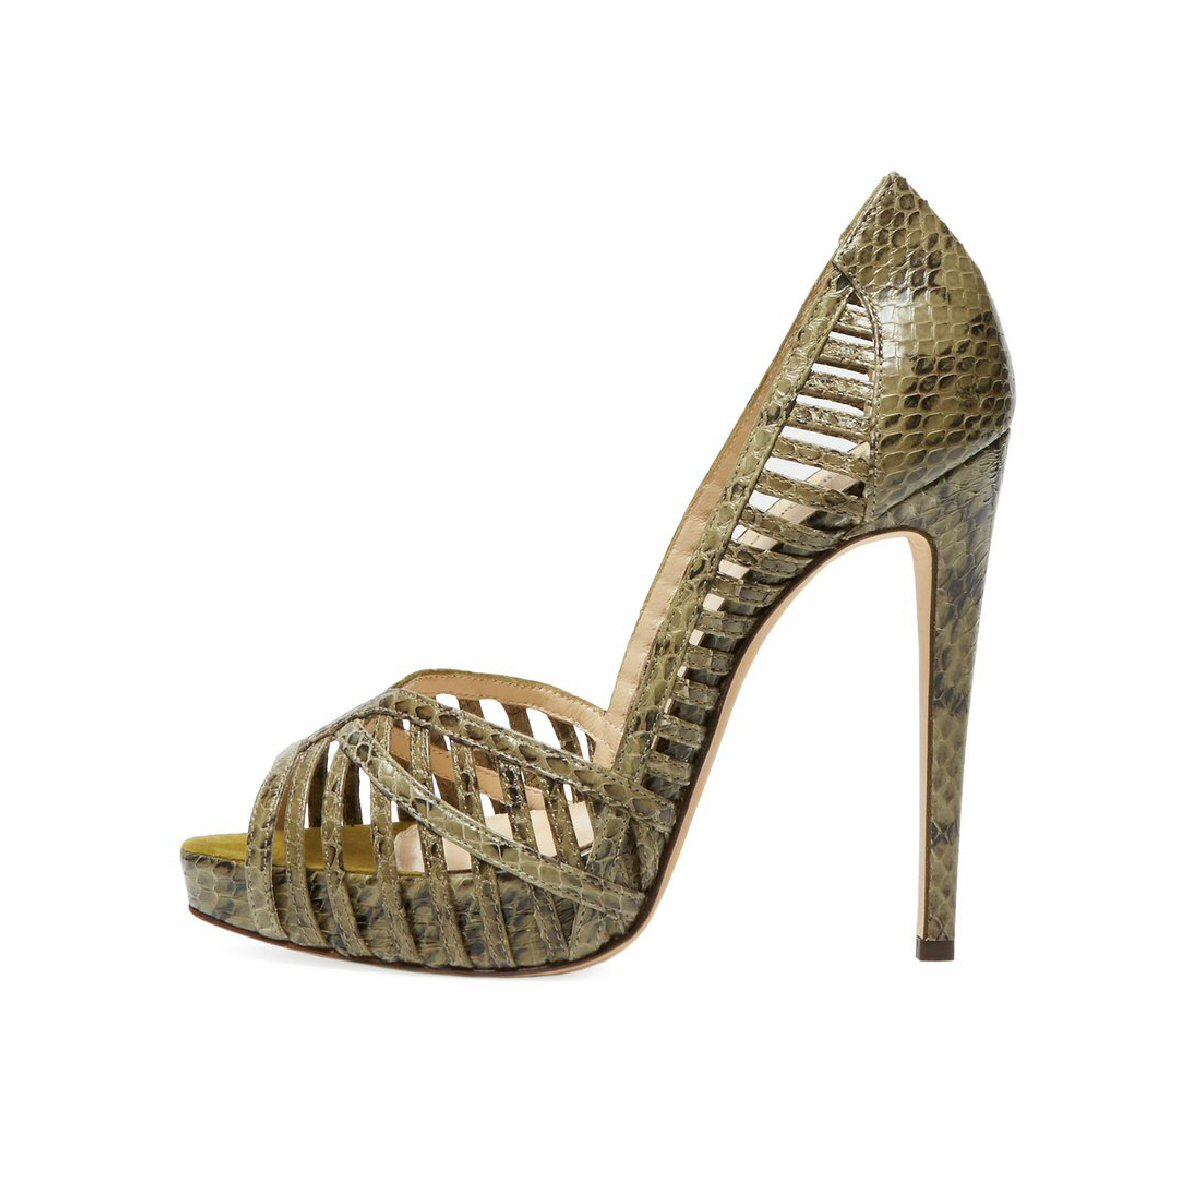 Birman Snakeskin Sandals-01